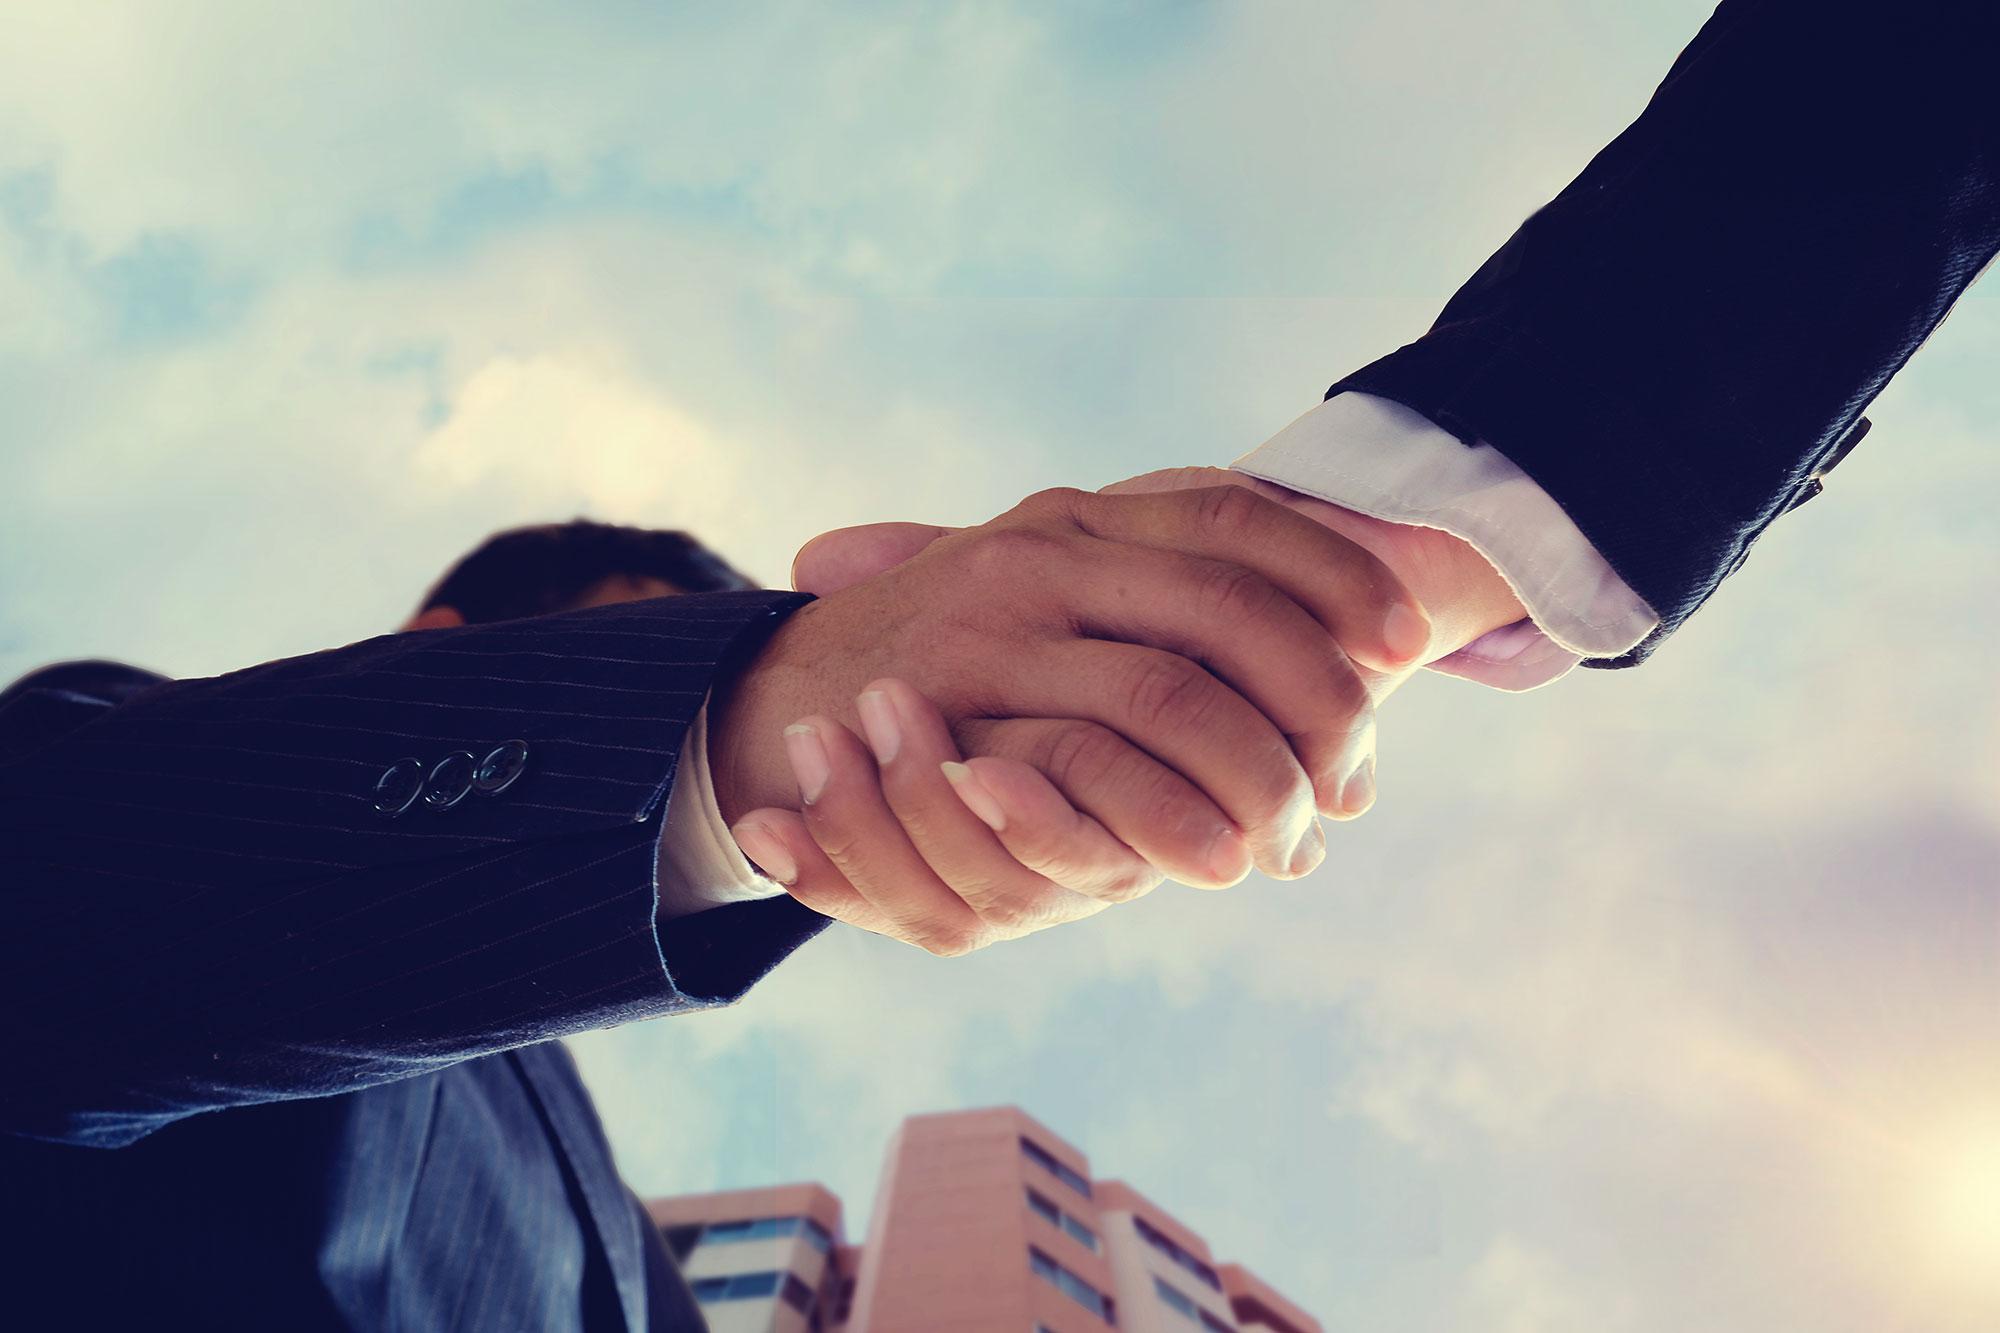 Avaya and Mitel? –A TelecomDisruption in the Market